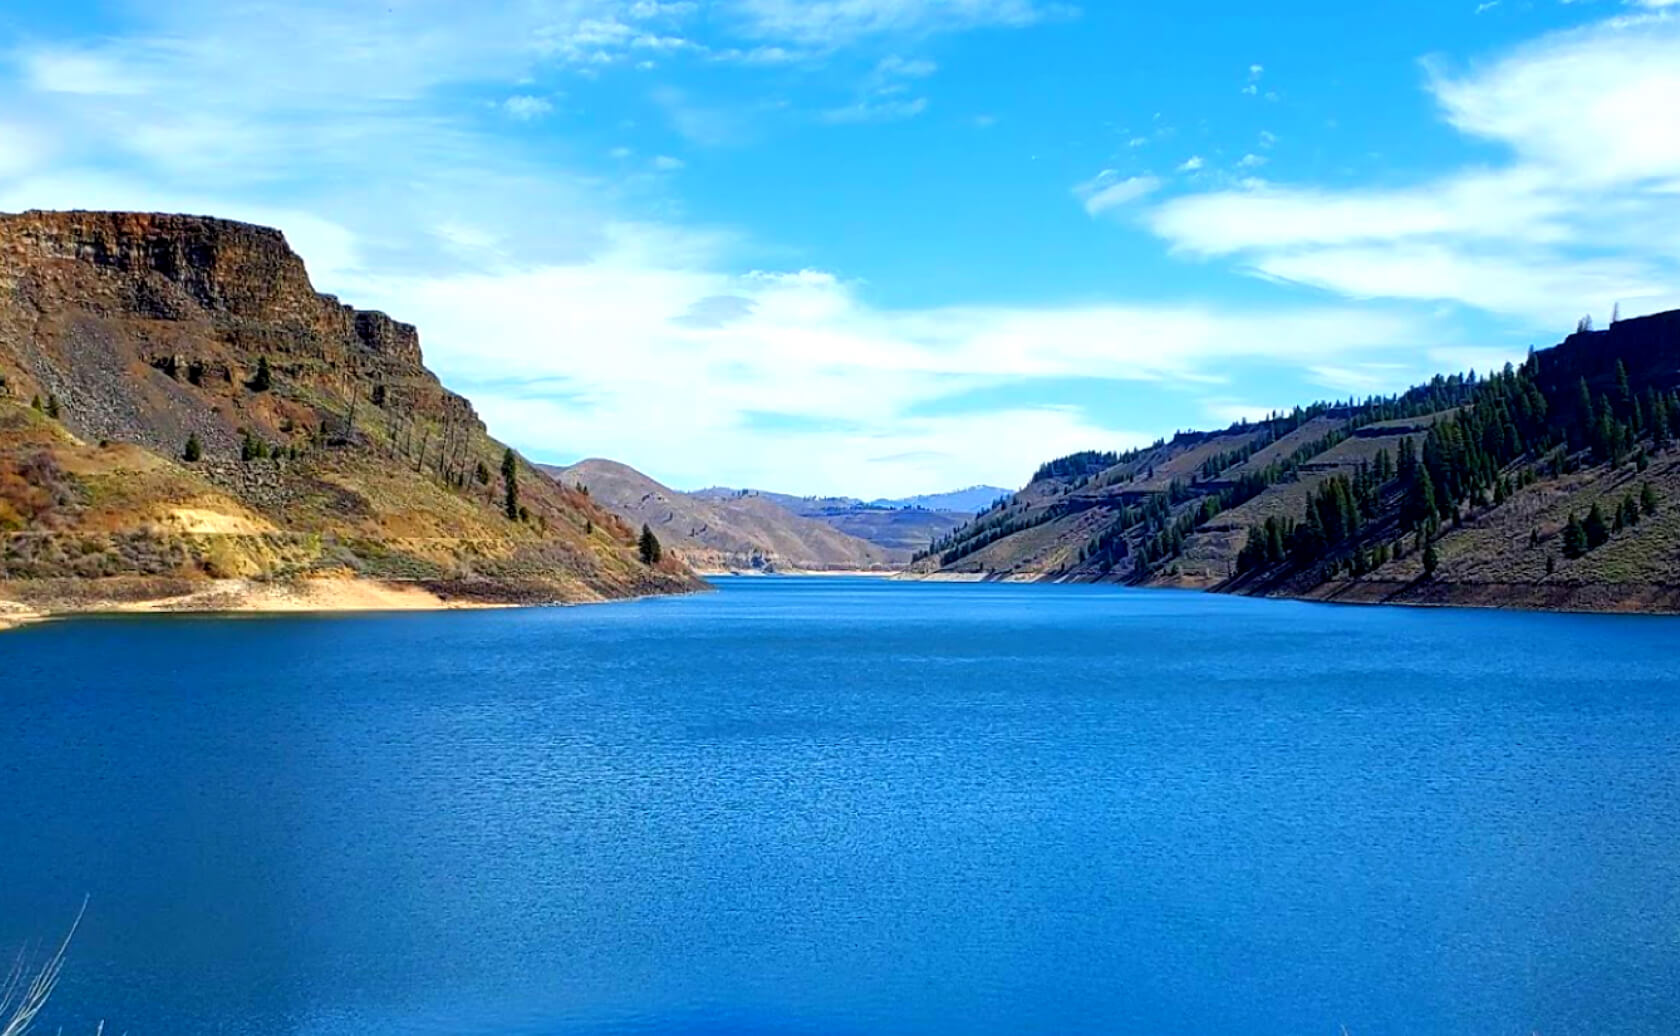 Anderson-Ranch-Lake-Fishing-Guide-Report-Idaho-01